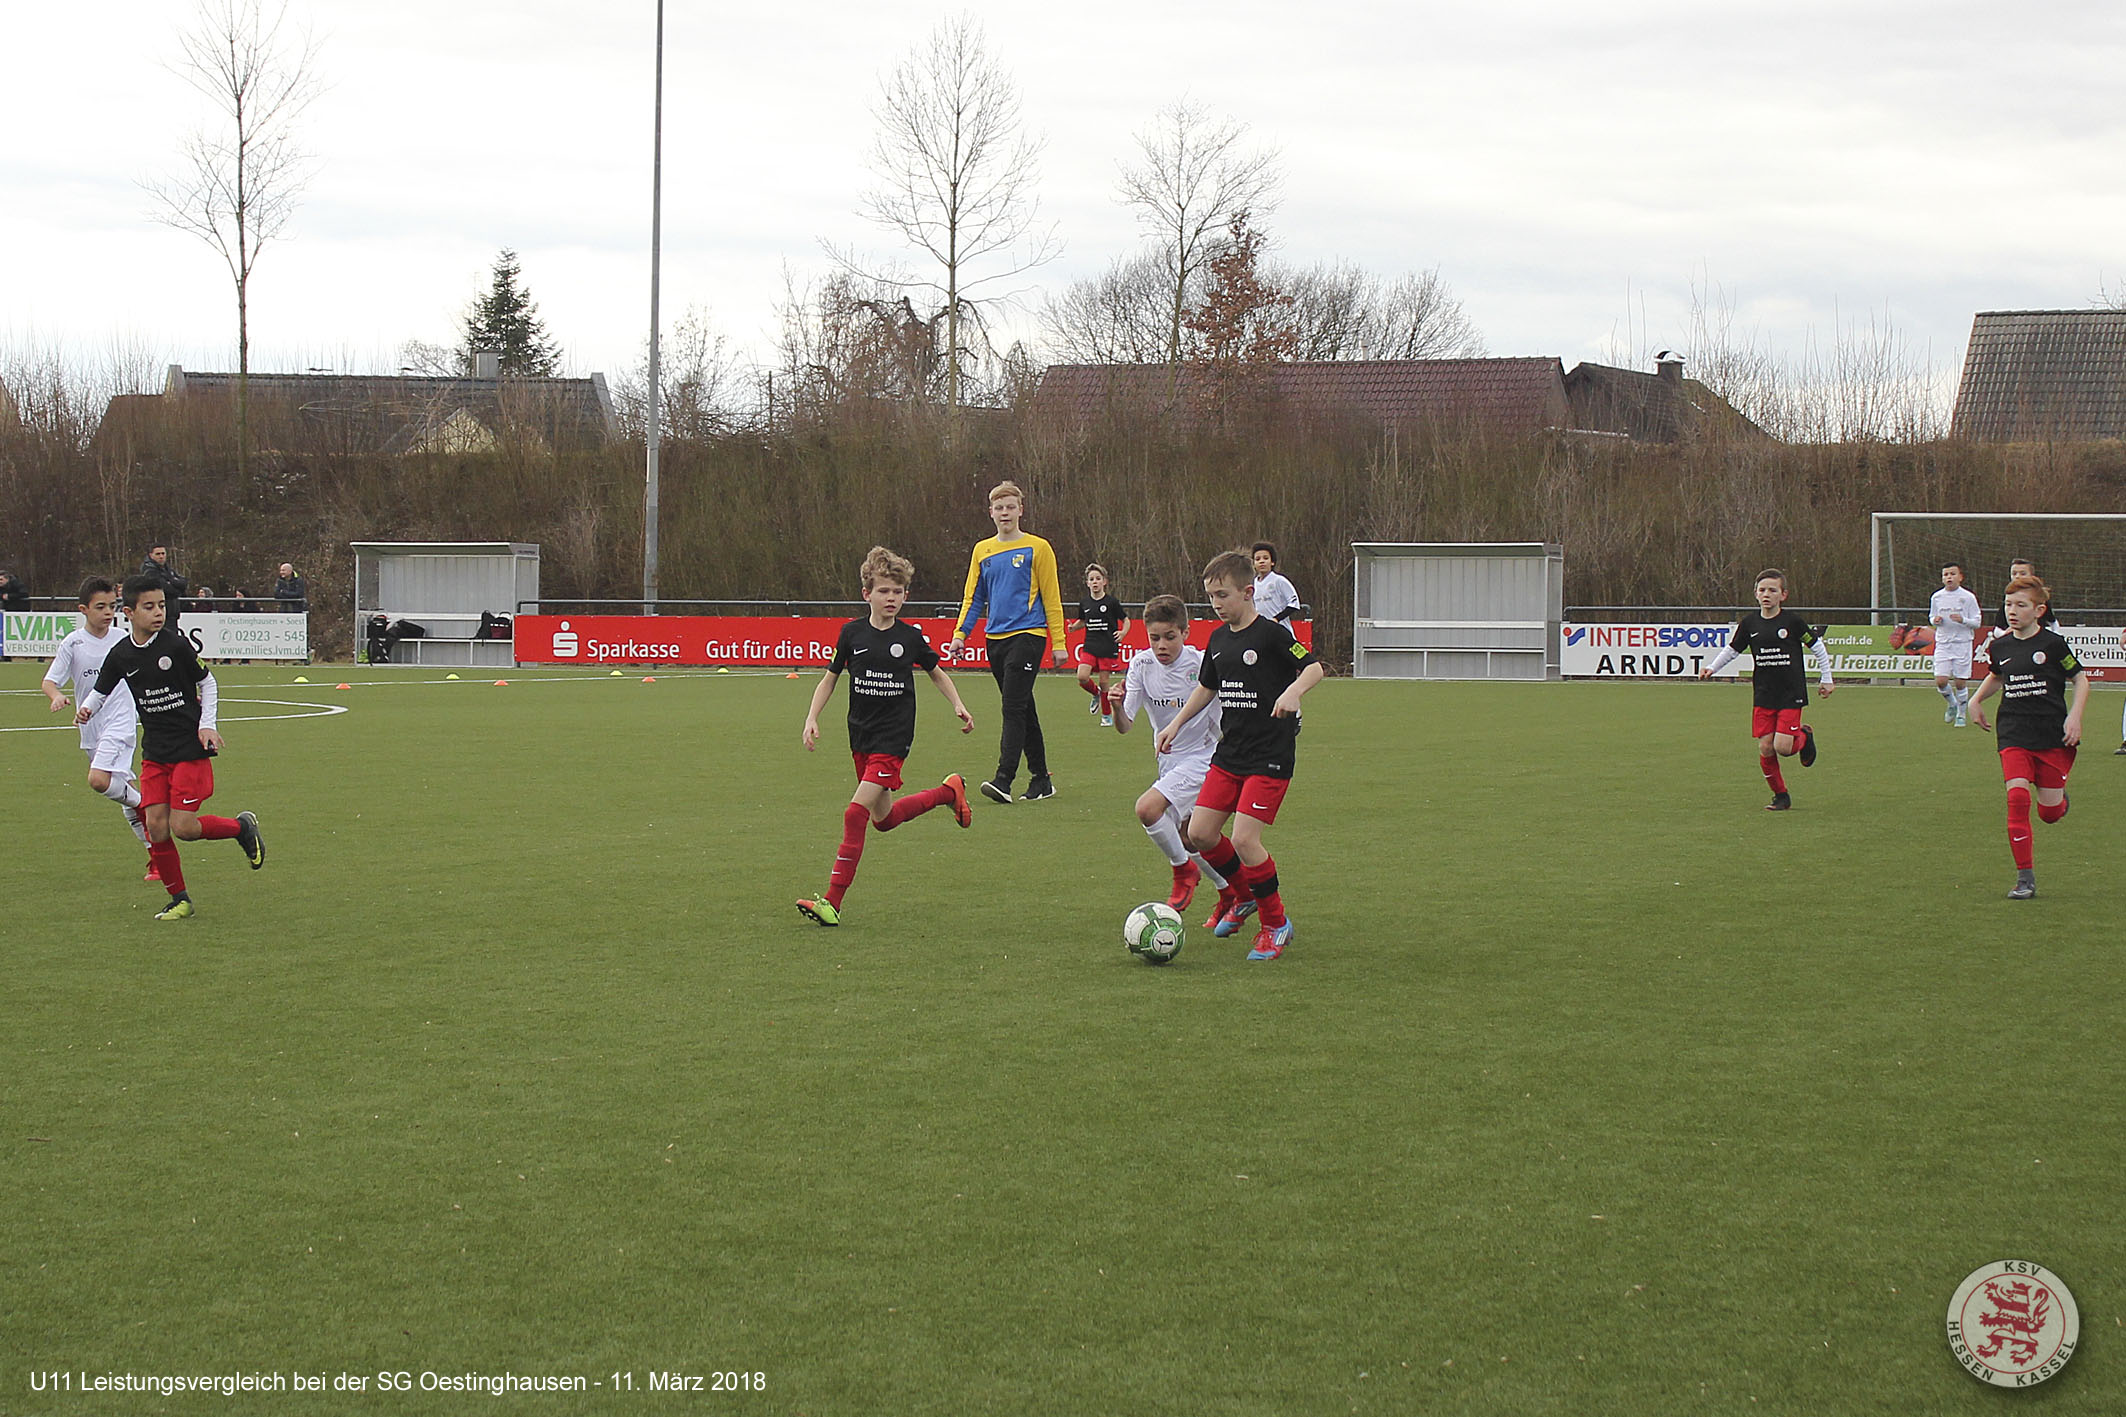 U11 Leistungsvergleich SG Oestinghausen